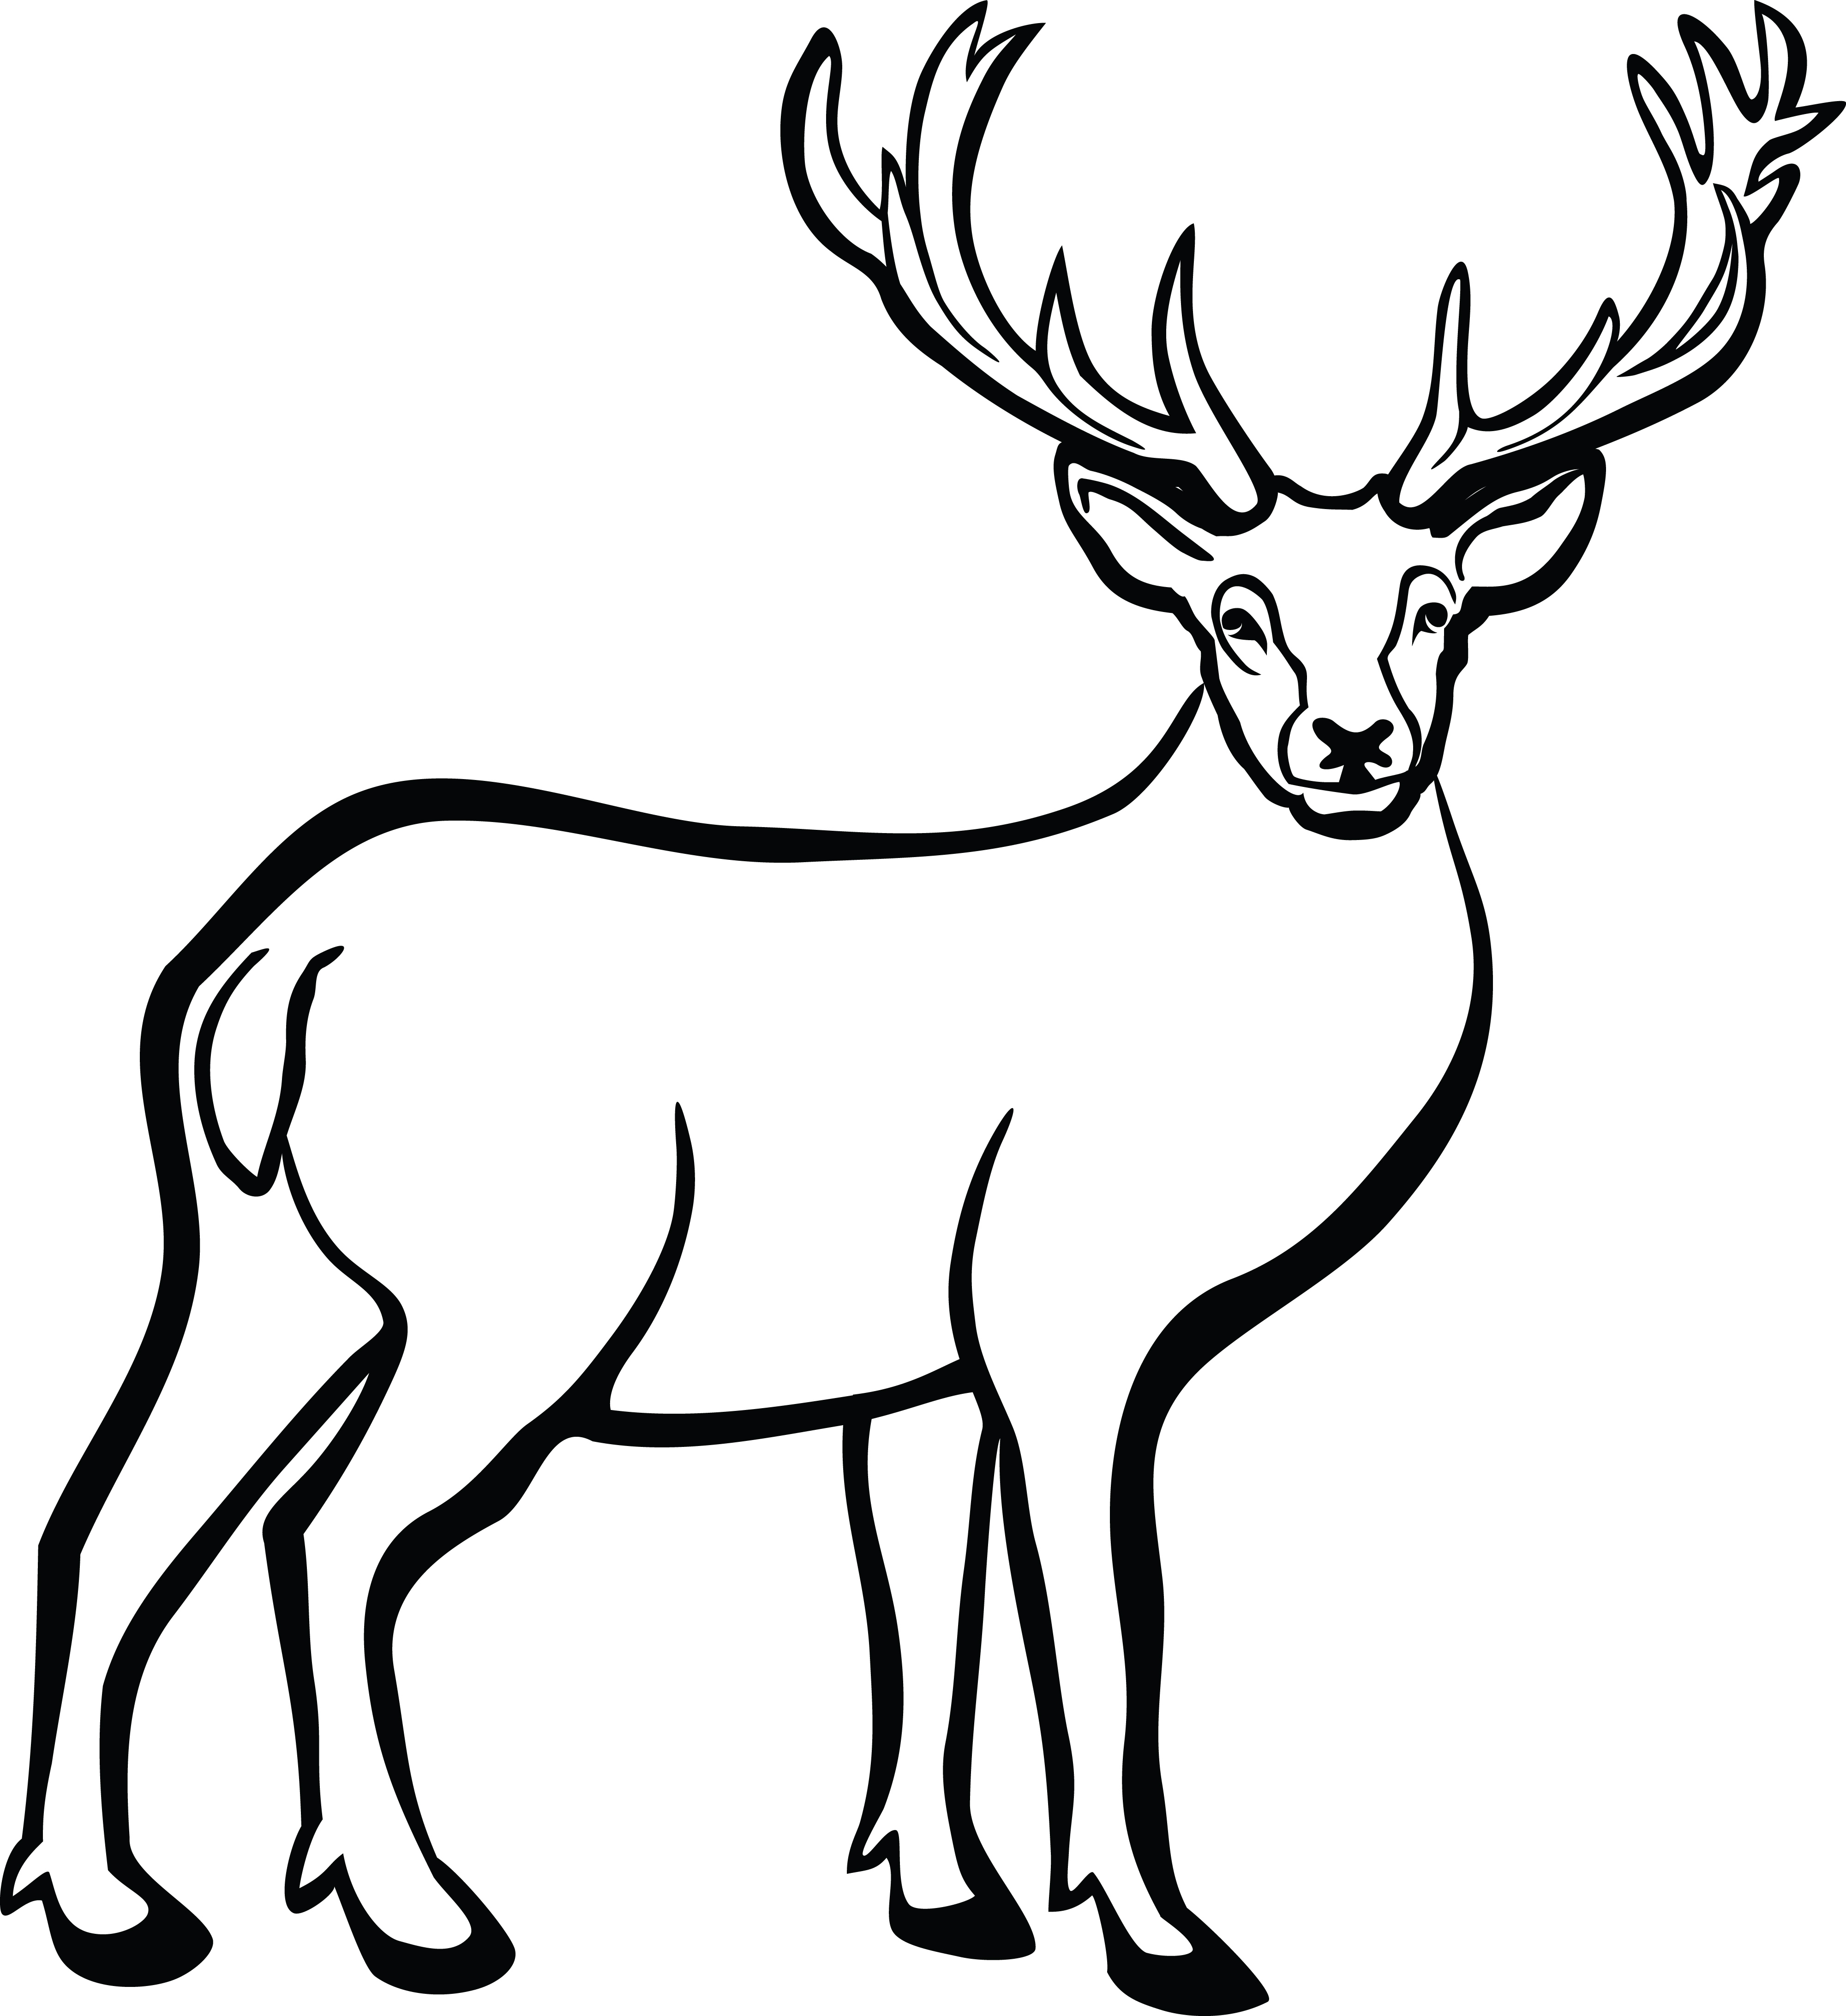 4000x4368 Buck Clipart Line Art, Buck Line Art Transparent Free For Download